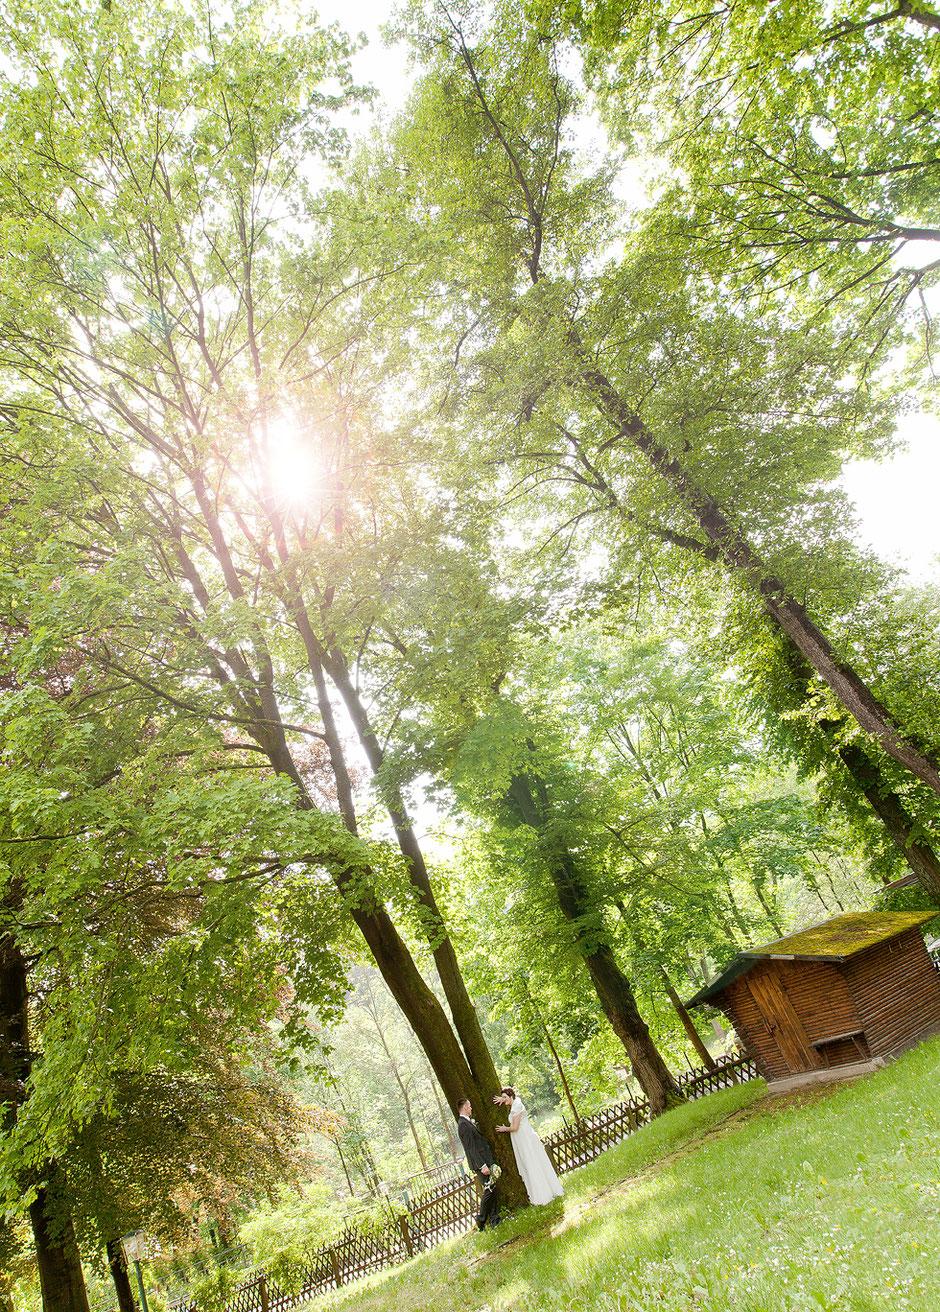 park villa willisch, hochzeitsfotos amtsberg, amtsberg bei zschopau fotograf